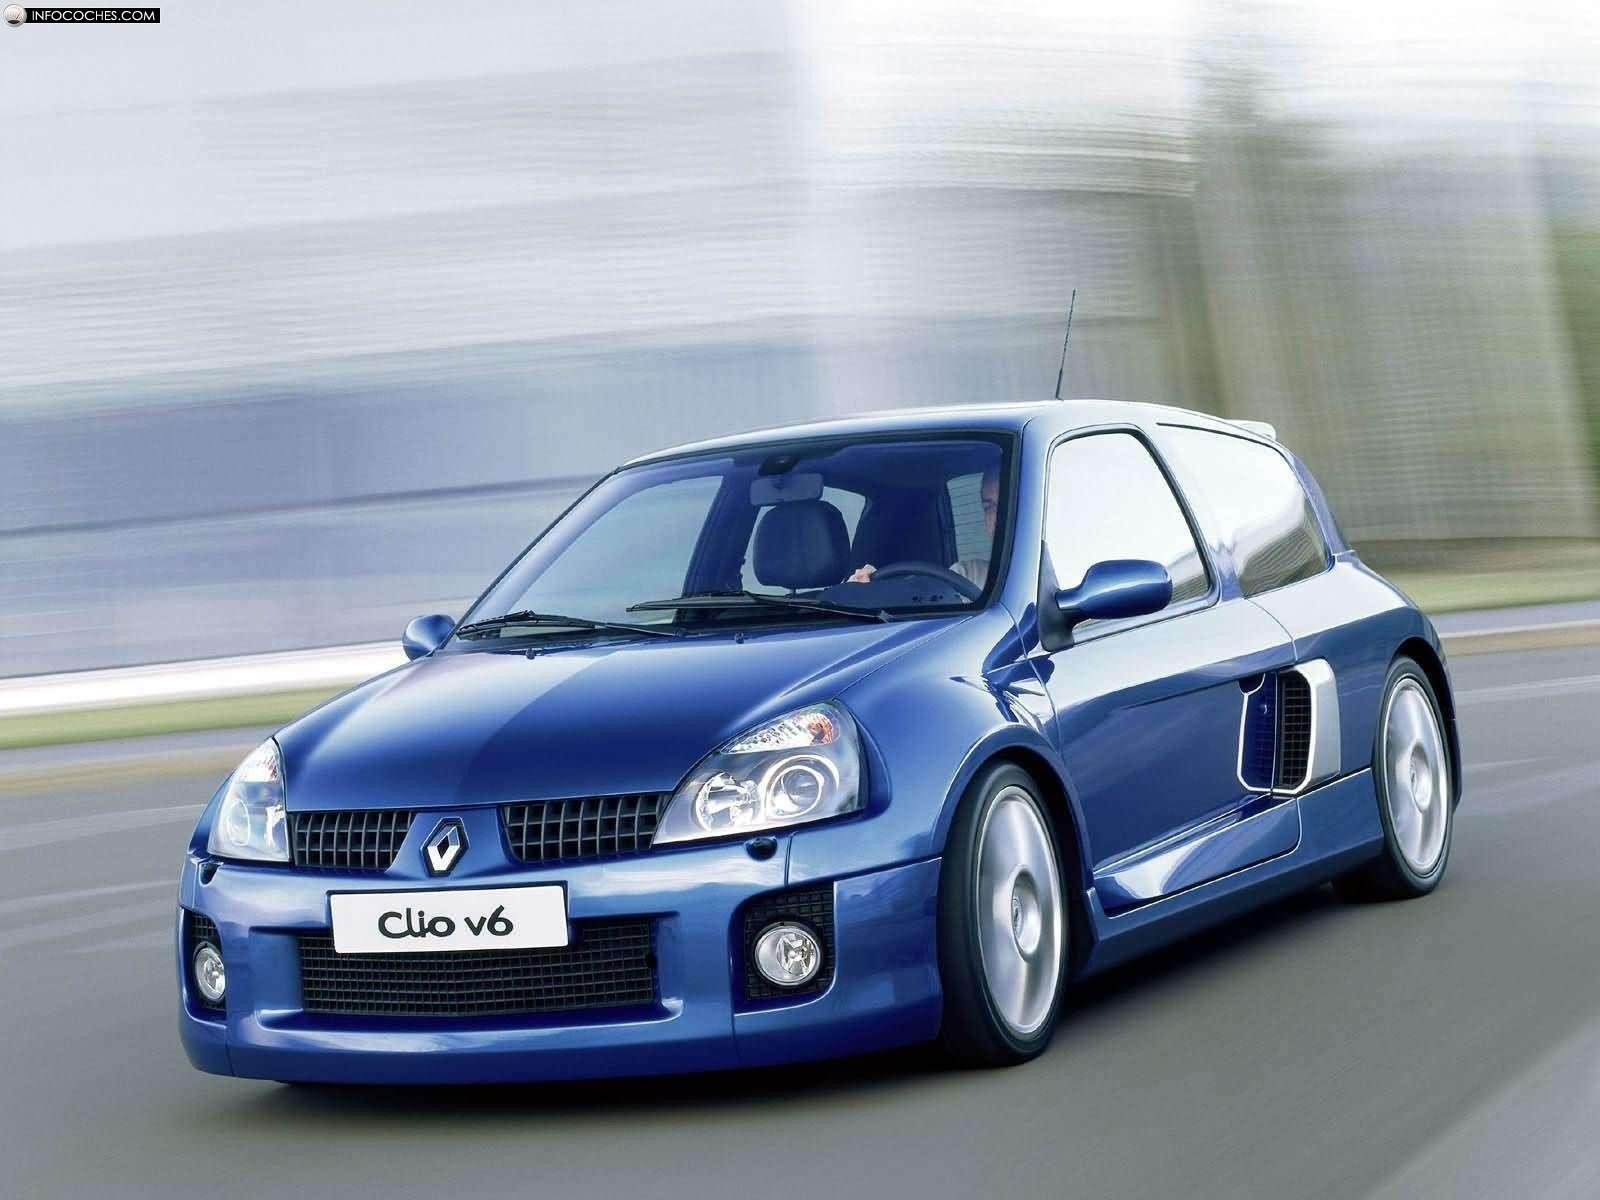 cars vehicles renault clio renault sports cars renault clio v6 wallpaper 1600x1200 184118. Black Bedroom Furniture Sets. Home Design Ideas